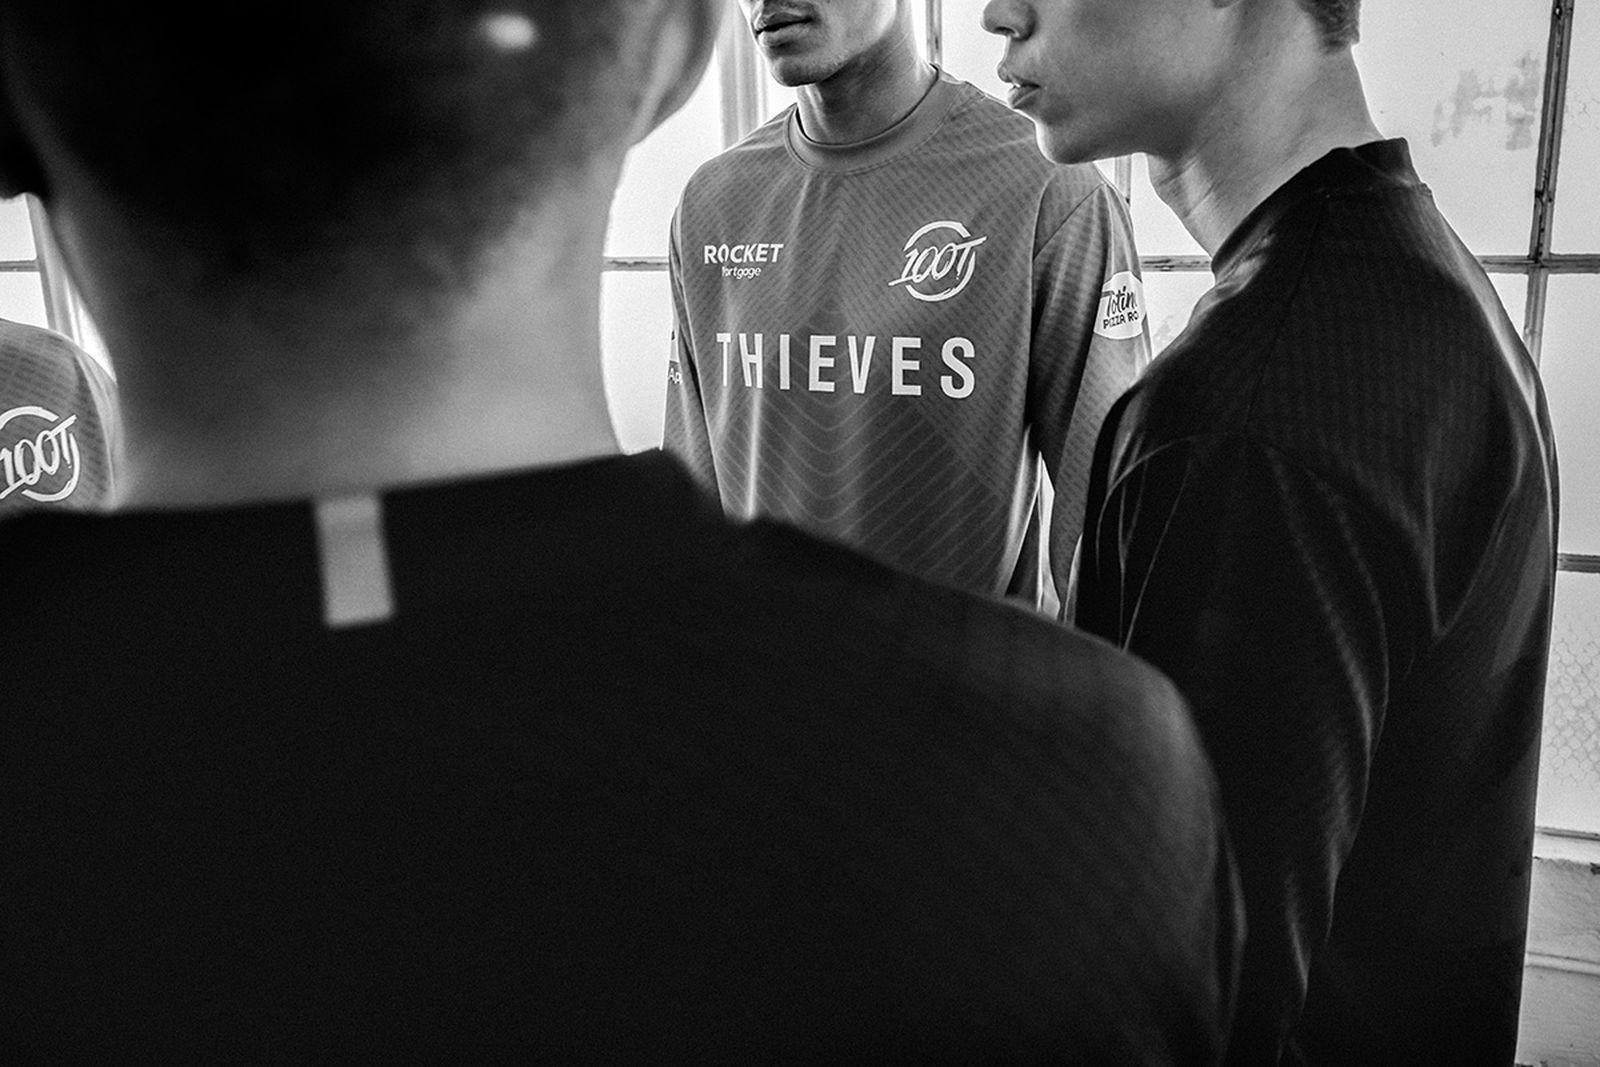 100-thieves-2020-jerseys-02